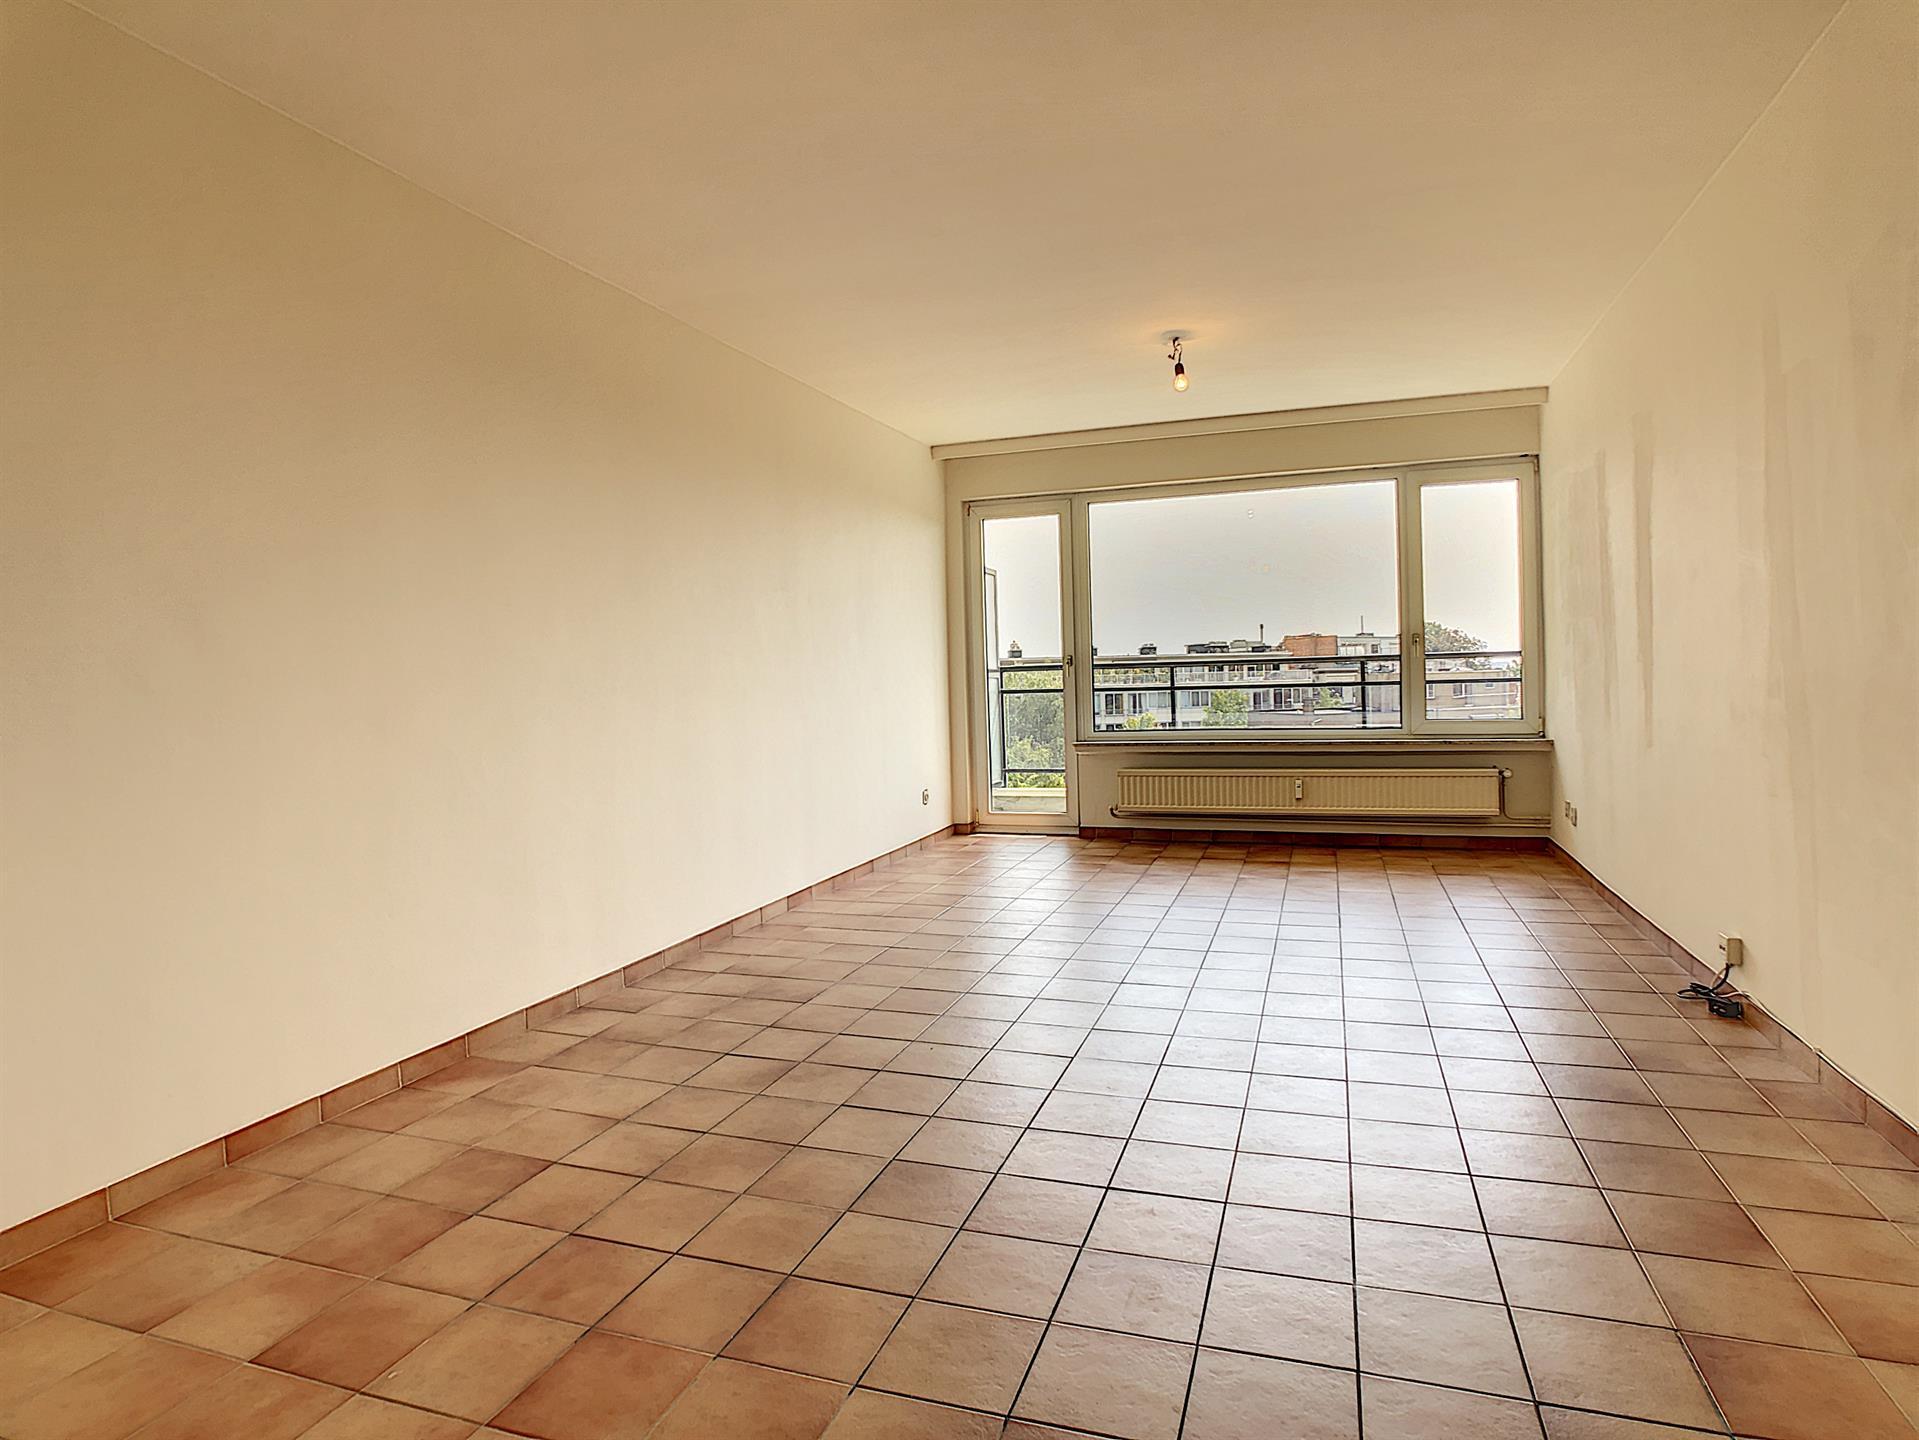 Appartement - Jette - #4117916-6